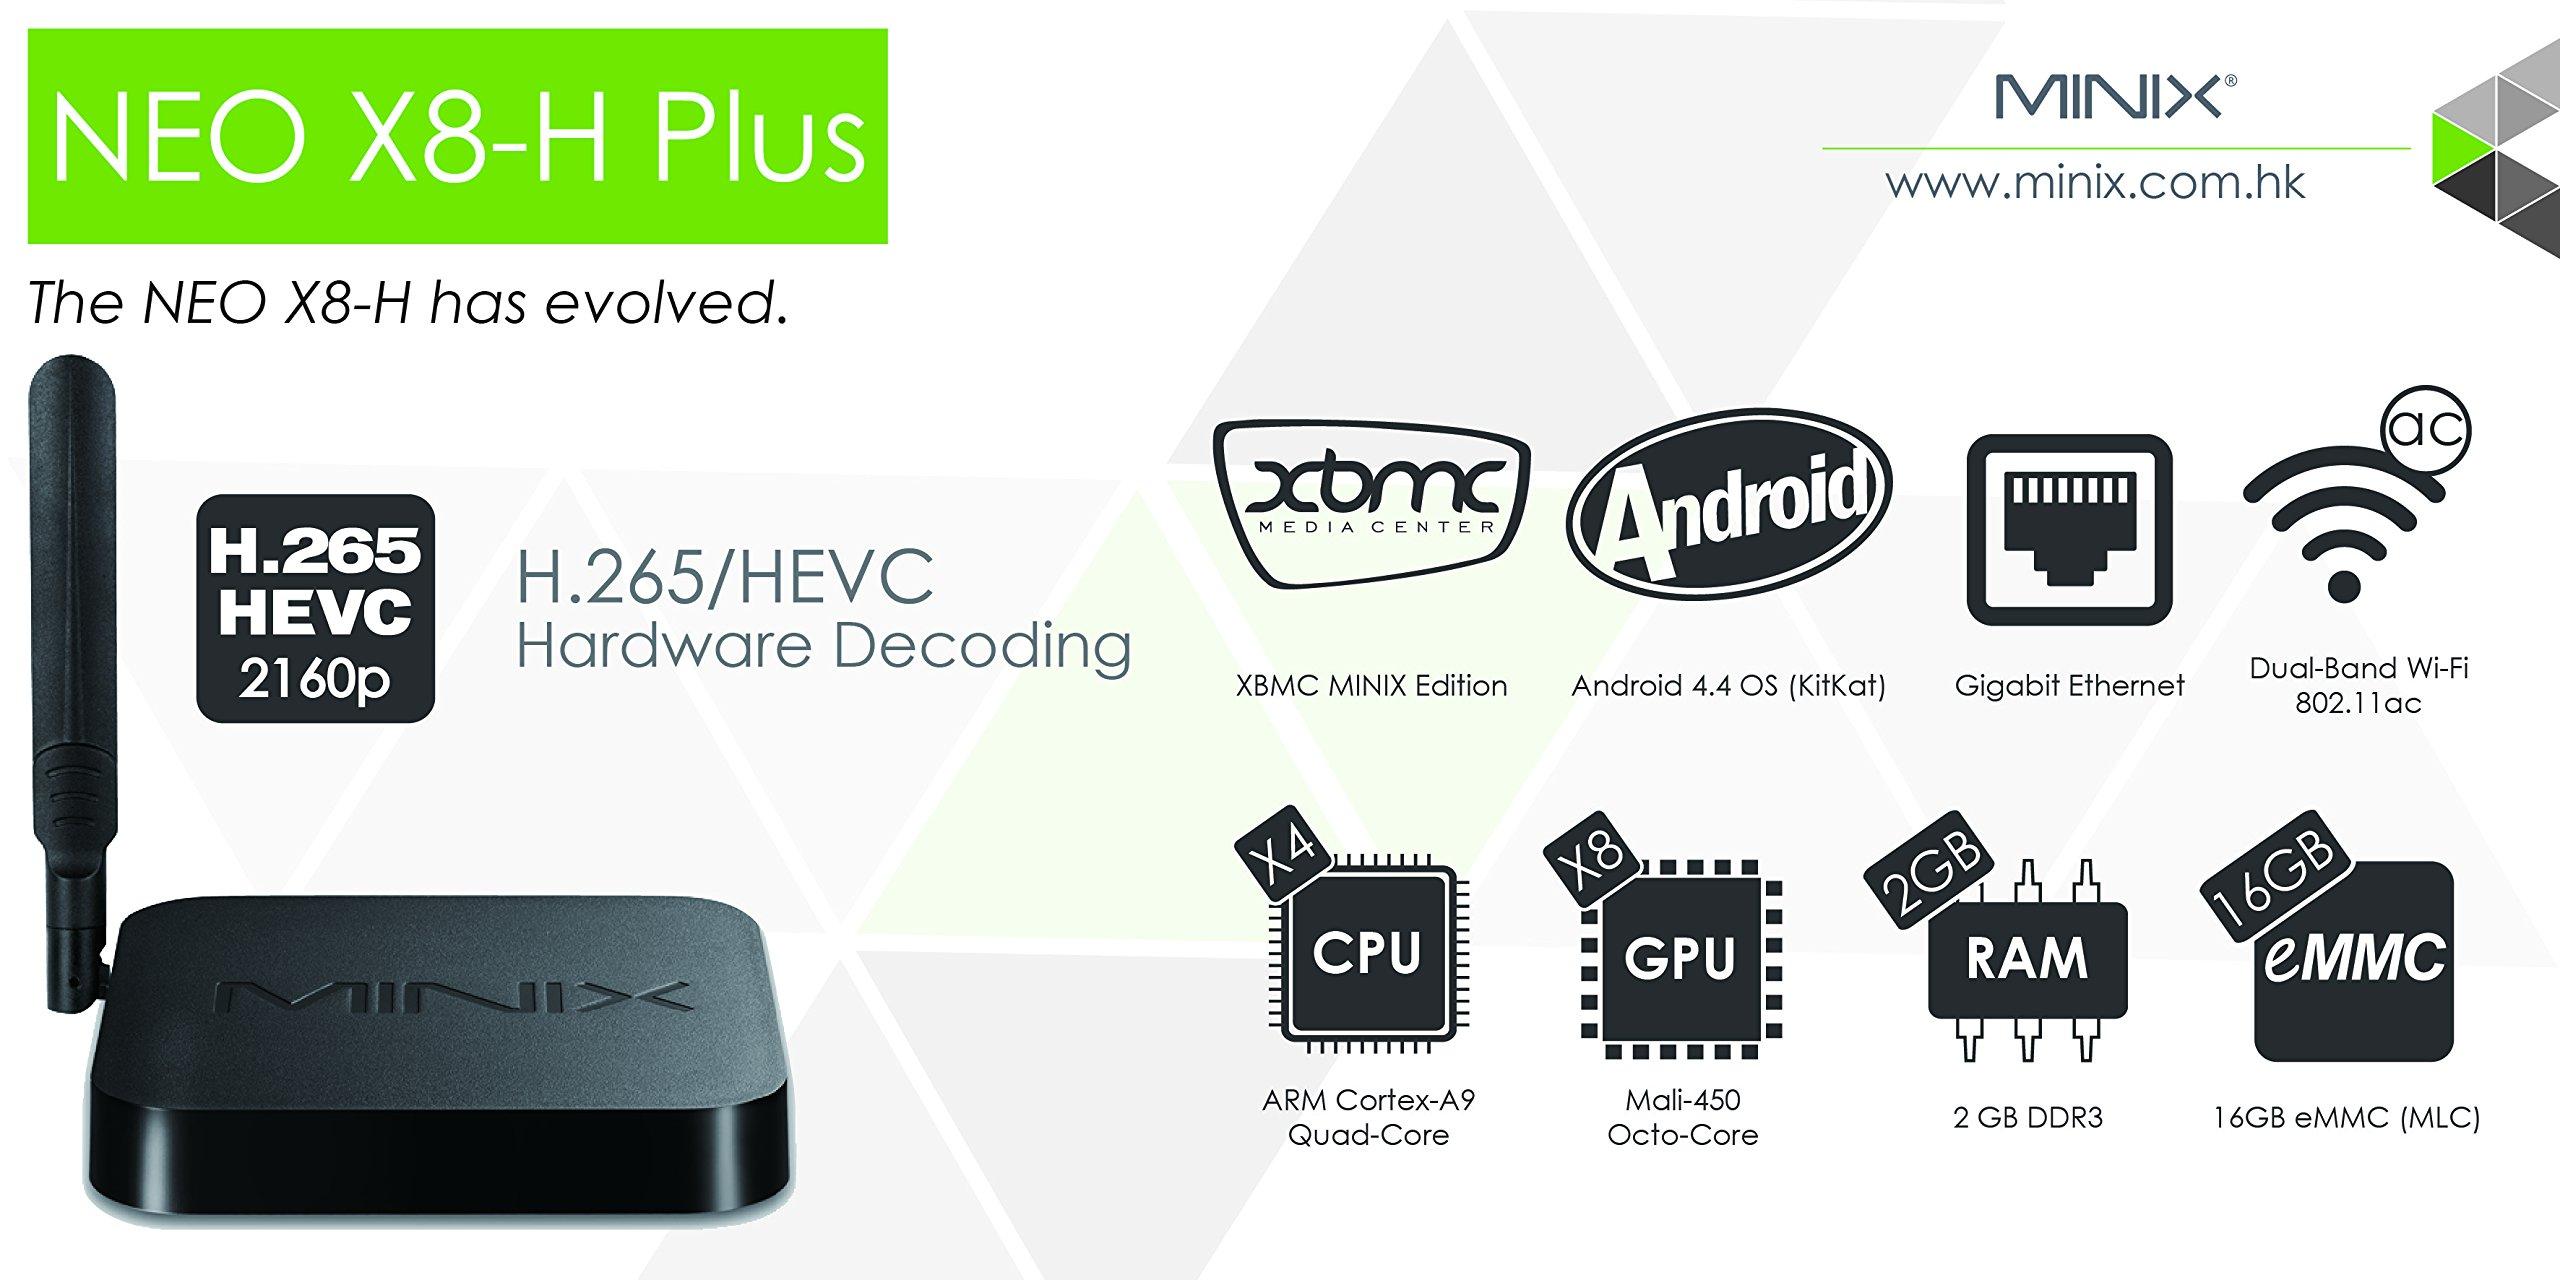 MINIX X8-H Plus Smart TV Box Mini PC & Media Streaming Player Amlogic S812-H Quad-Core Cortex-A9 Processor up to 2.0GHz Android 4.4.2 Full 2160p H.265/HEVC HDMI 2G/16G Hardware Recording by Jesurun (Image #5)